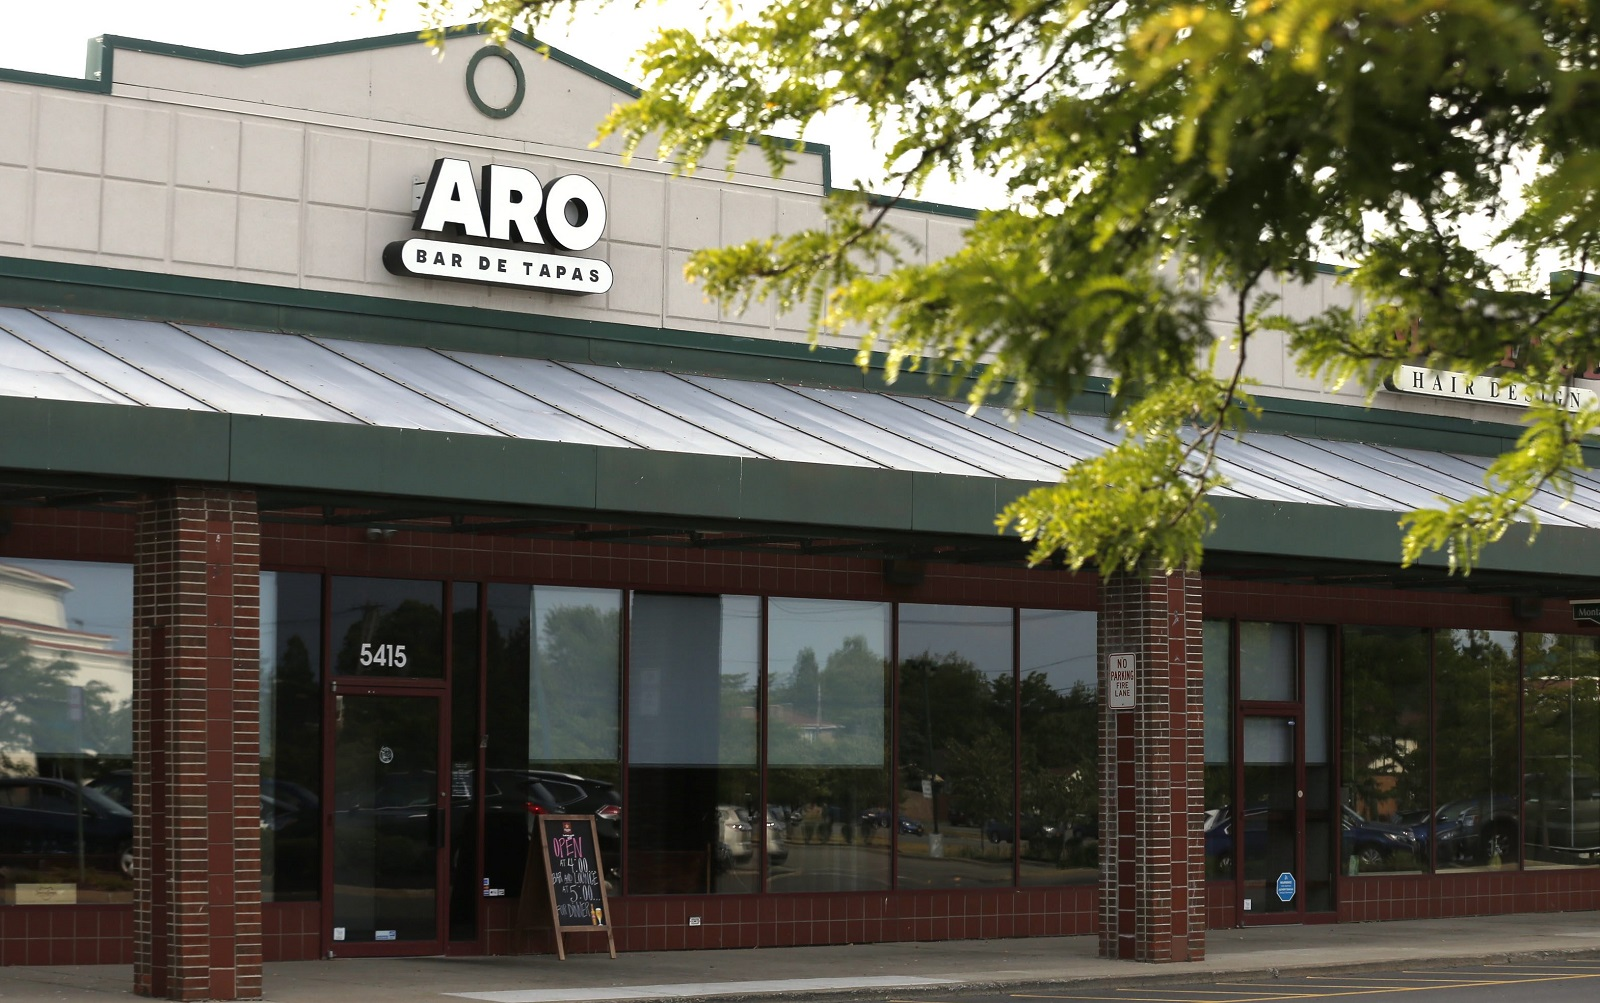 Aro Bar De Tapas on Sheridan Drive in Amherst. (Robert Kirkham/Buffalo News)